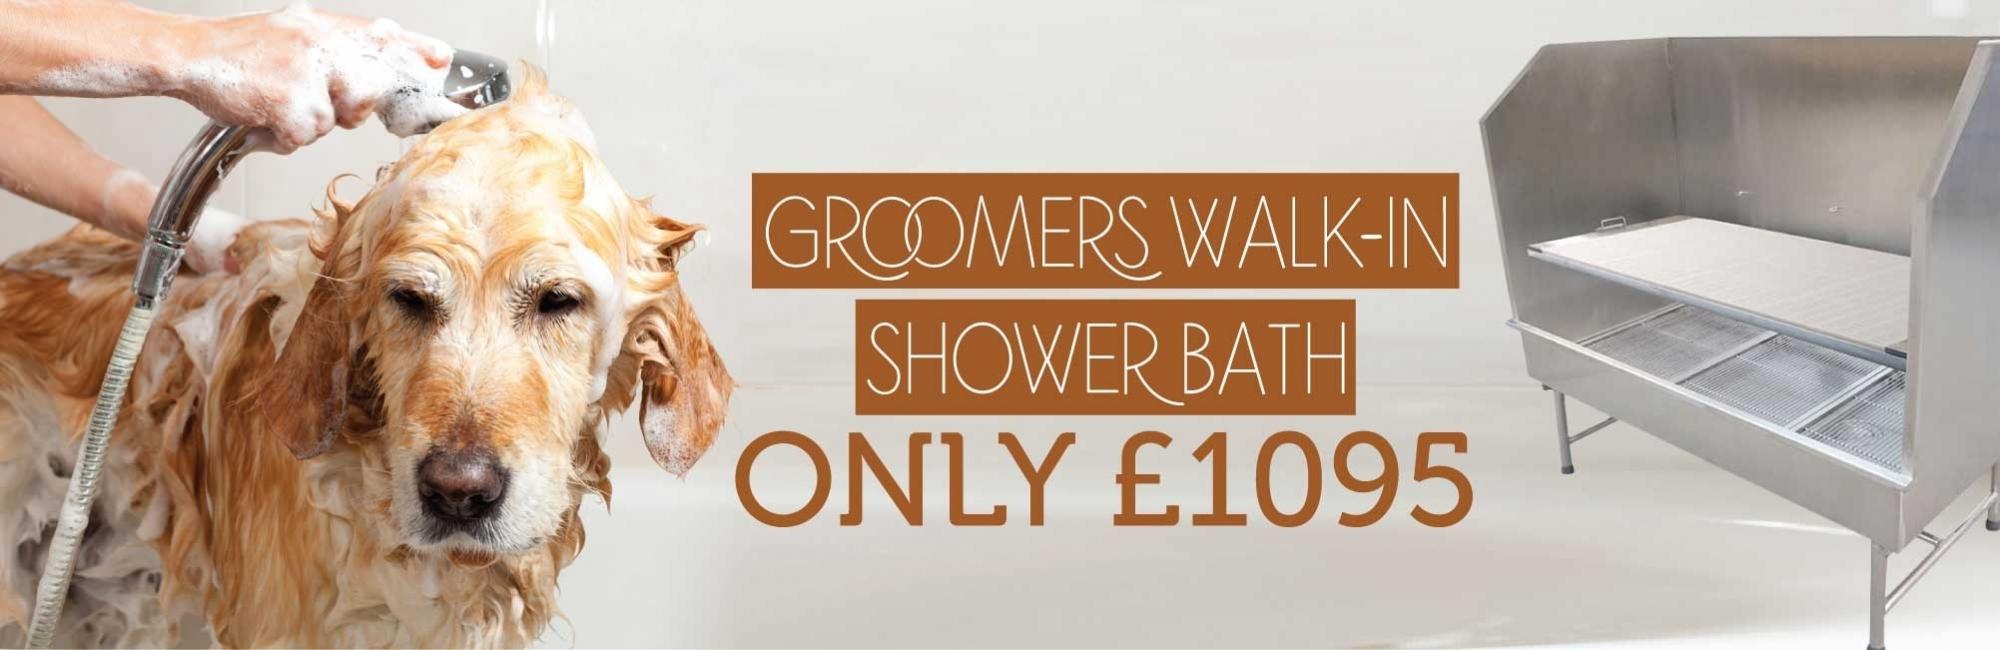 Groomers Walk-In Shower Bath Only £1095